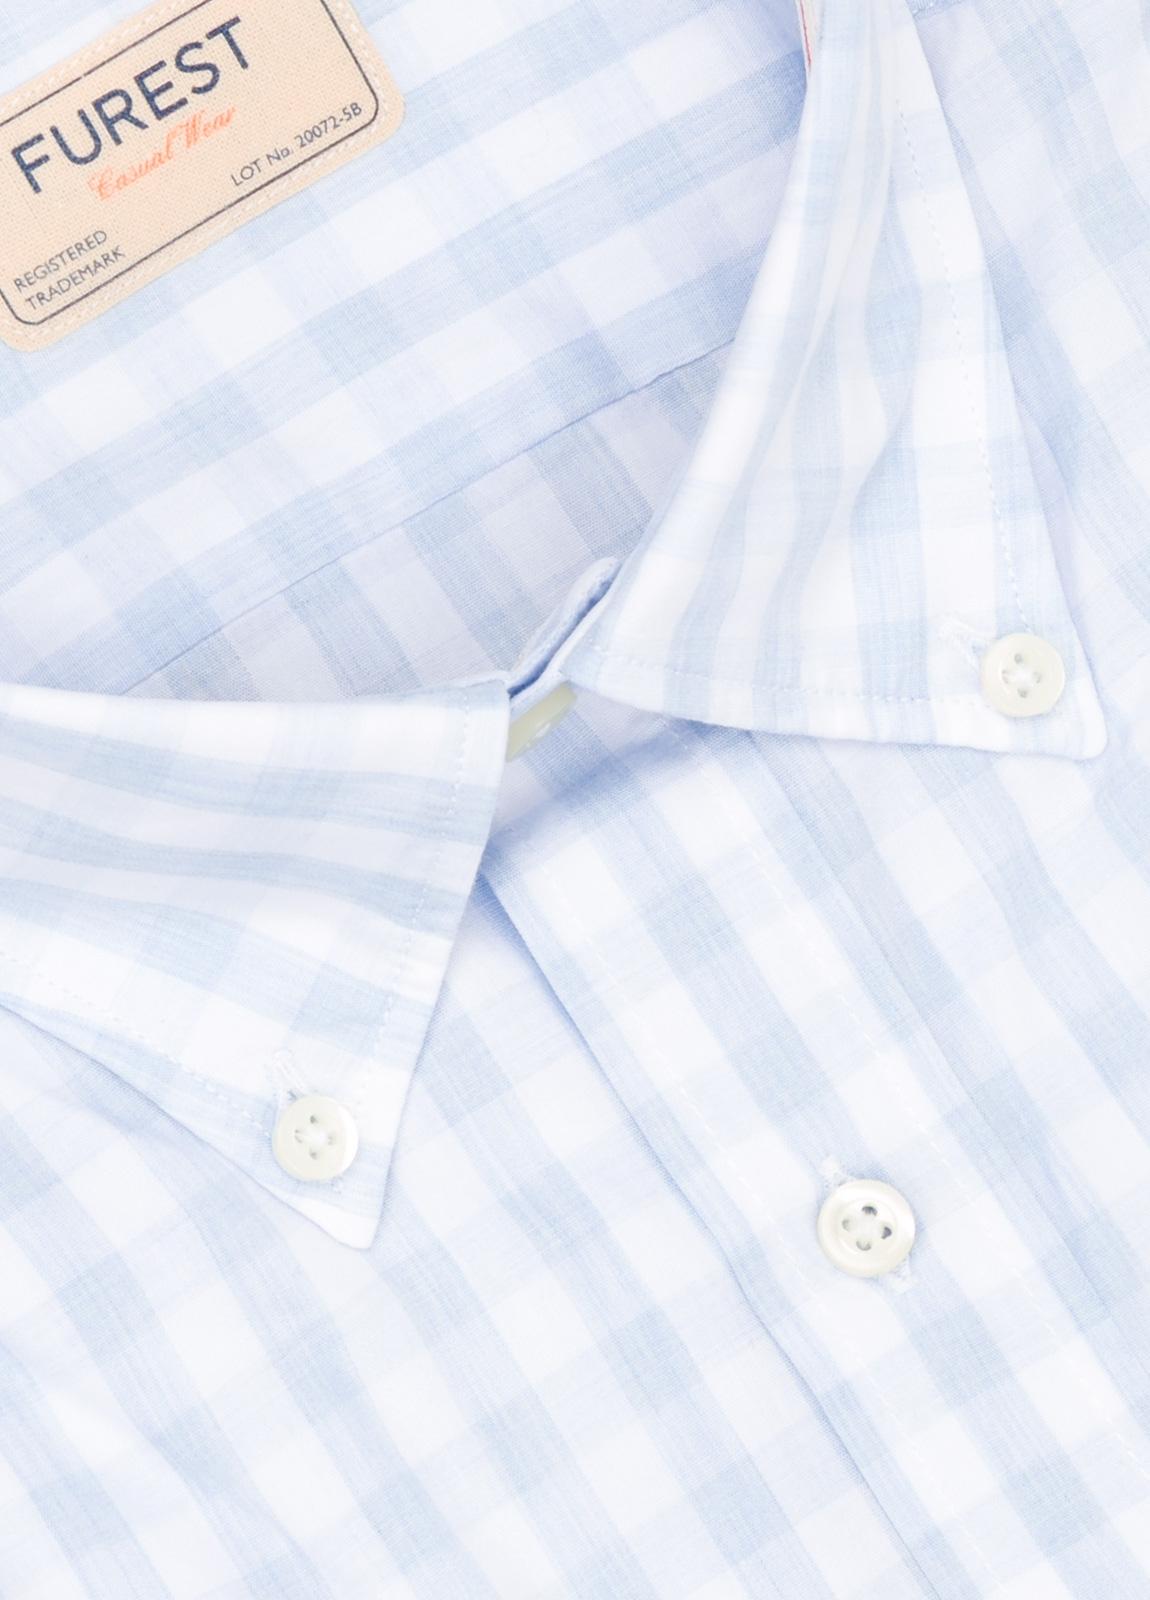 Camisa Casual Wear SLIM FIT Modelo BUTTON DOWN dibujo cuadros color celeste, 100% Algodón. - Ítem1